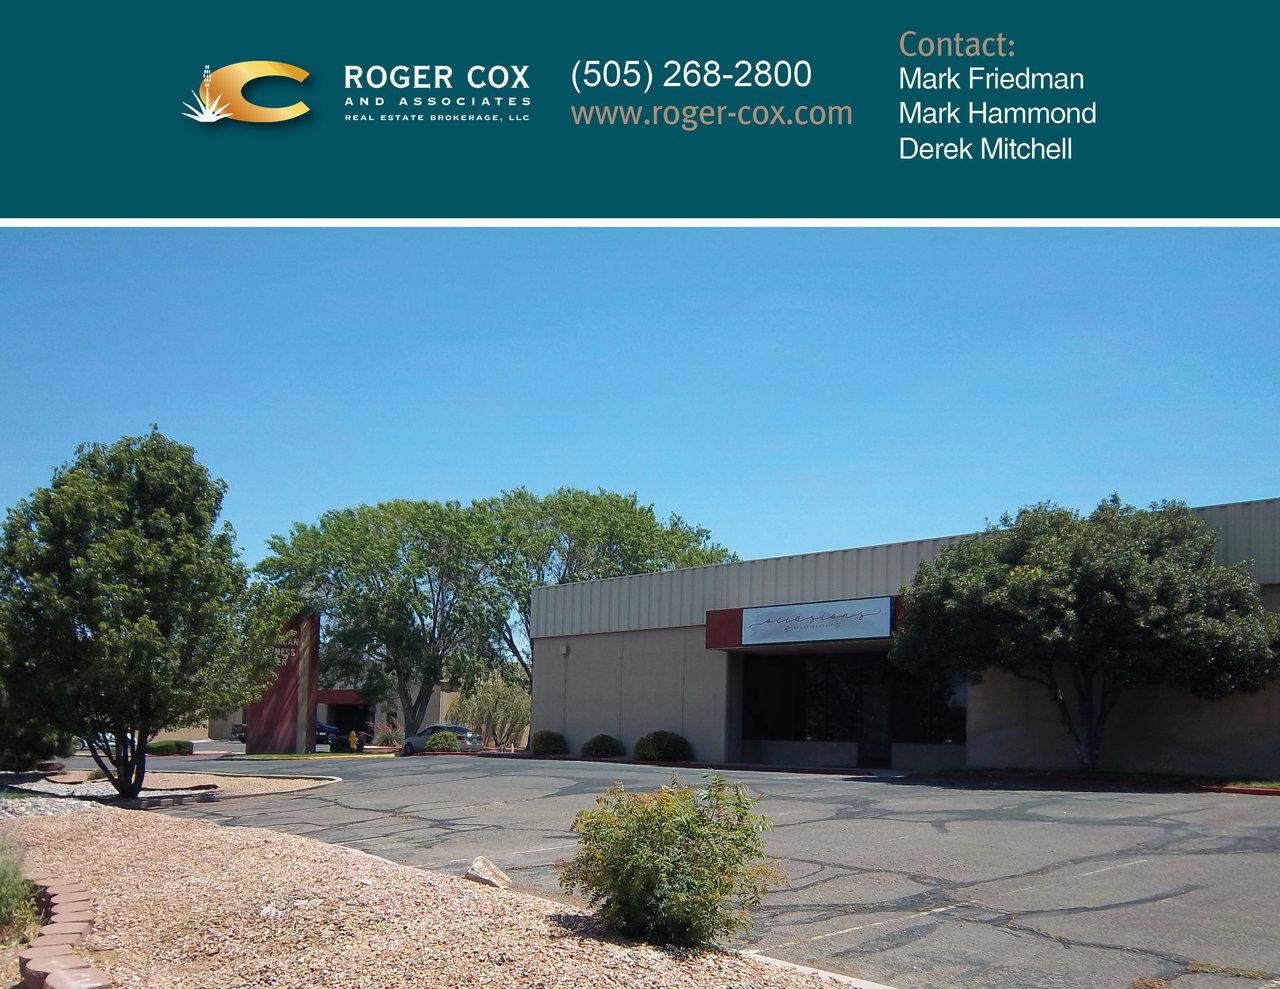 6100 Jefferson St NE, Albuquerque, NM, 87109